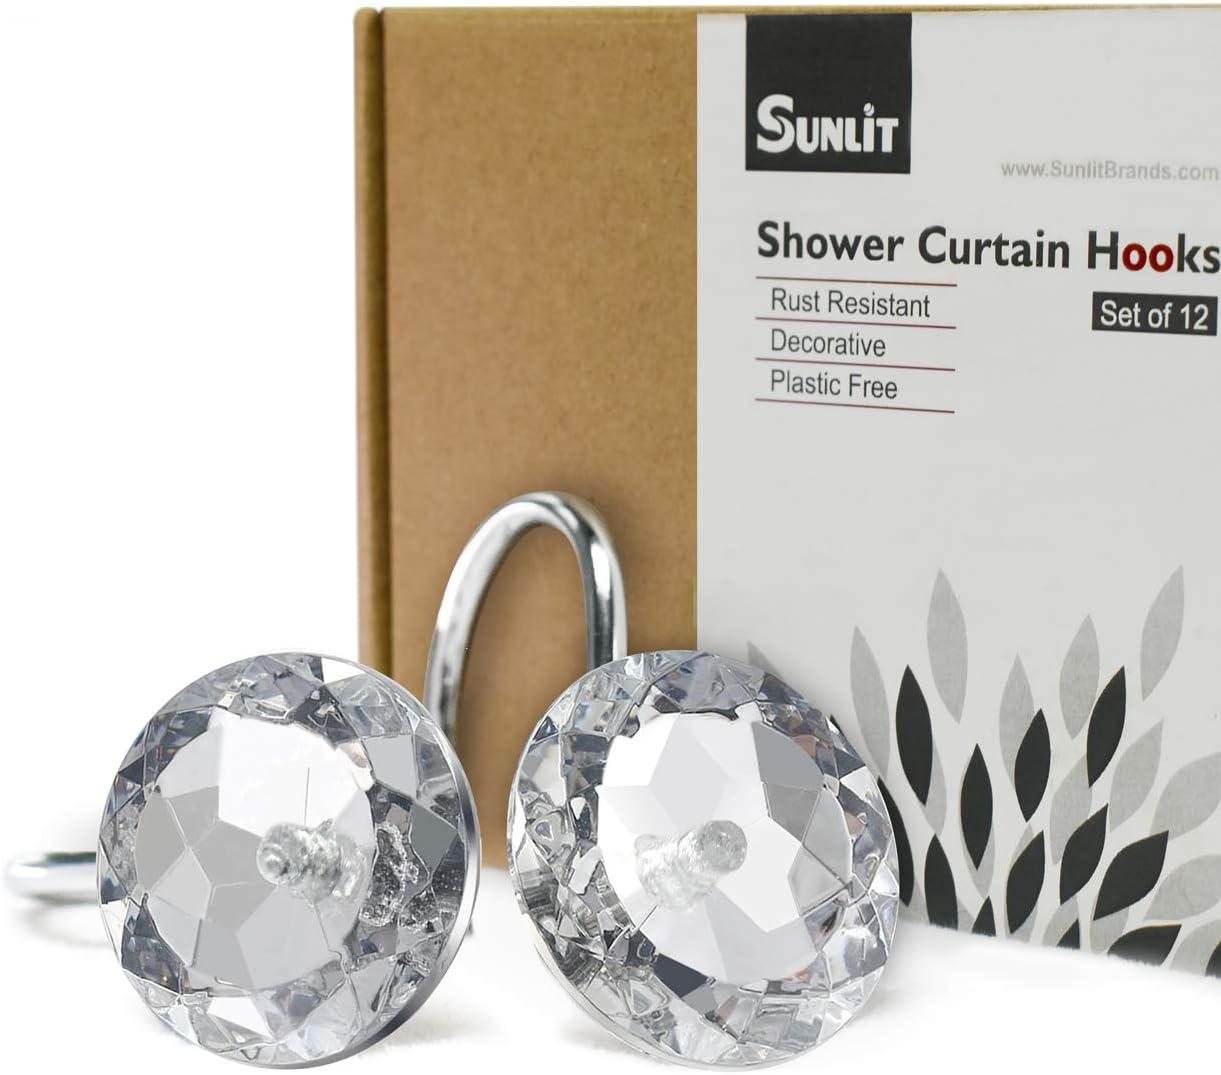 Transparent Sunlit 12x Crystal Diamond Bling Acrylic Shower Curtain Hooks Shower Rings Round Decorative Rhinestones Rolling Bathroom Bath Set